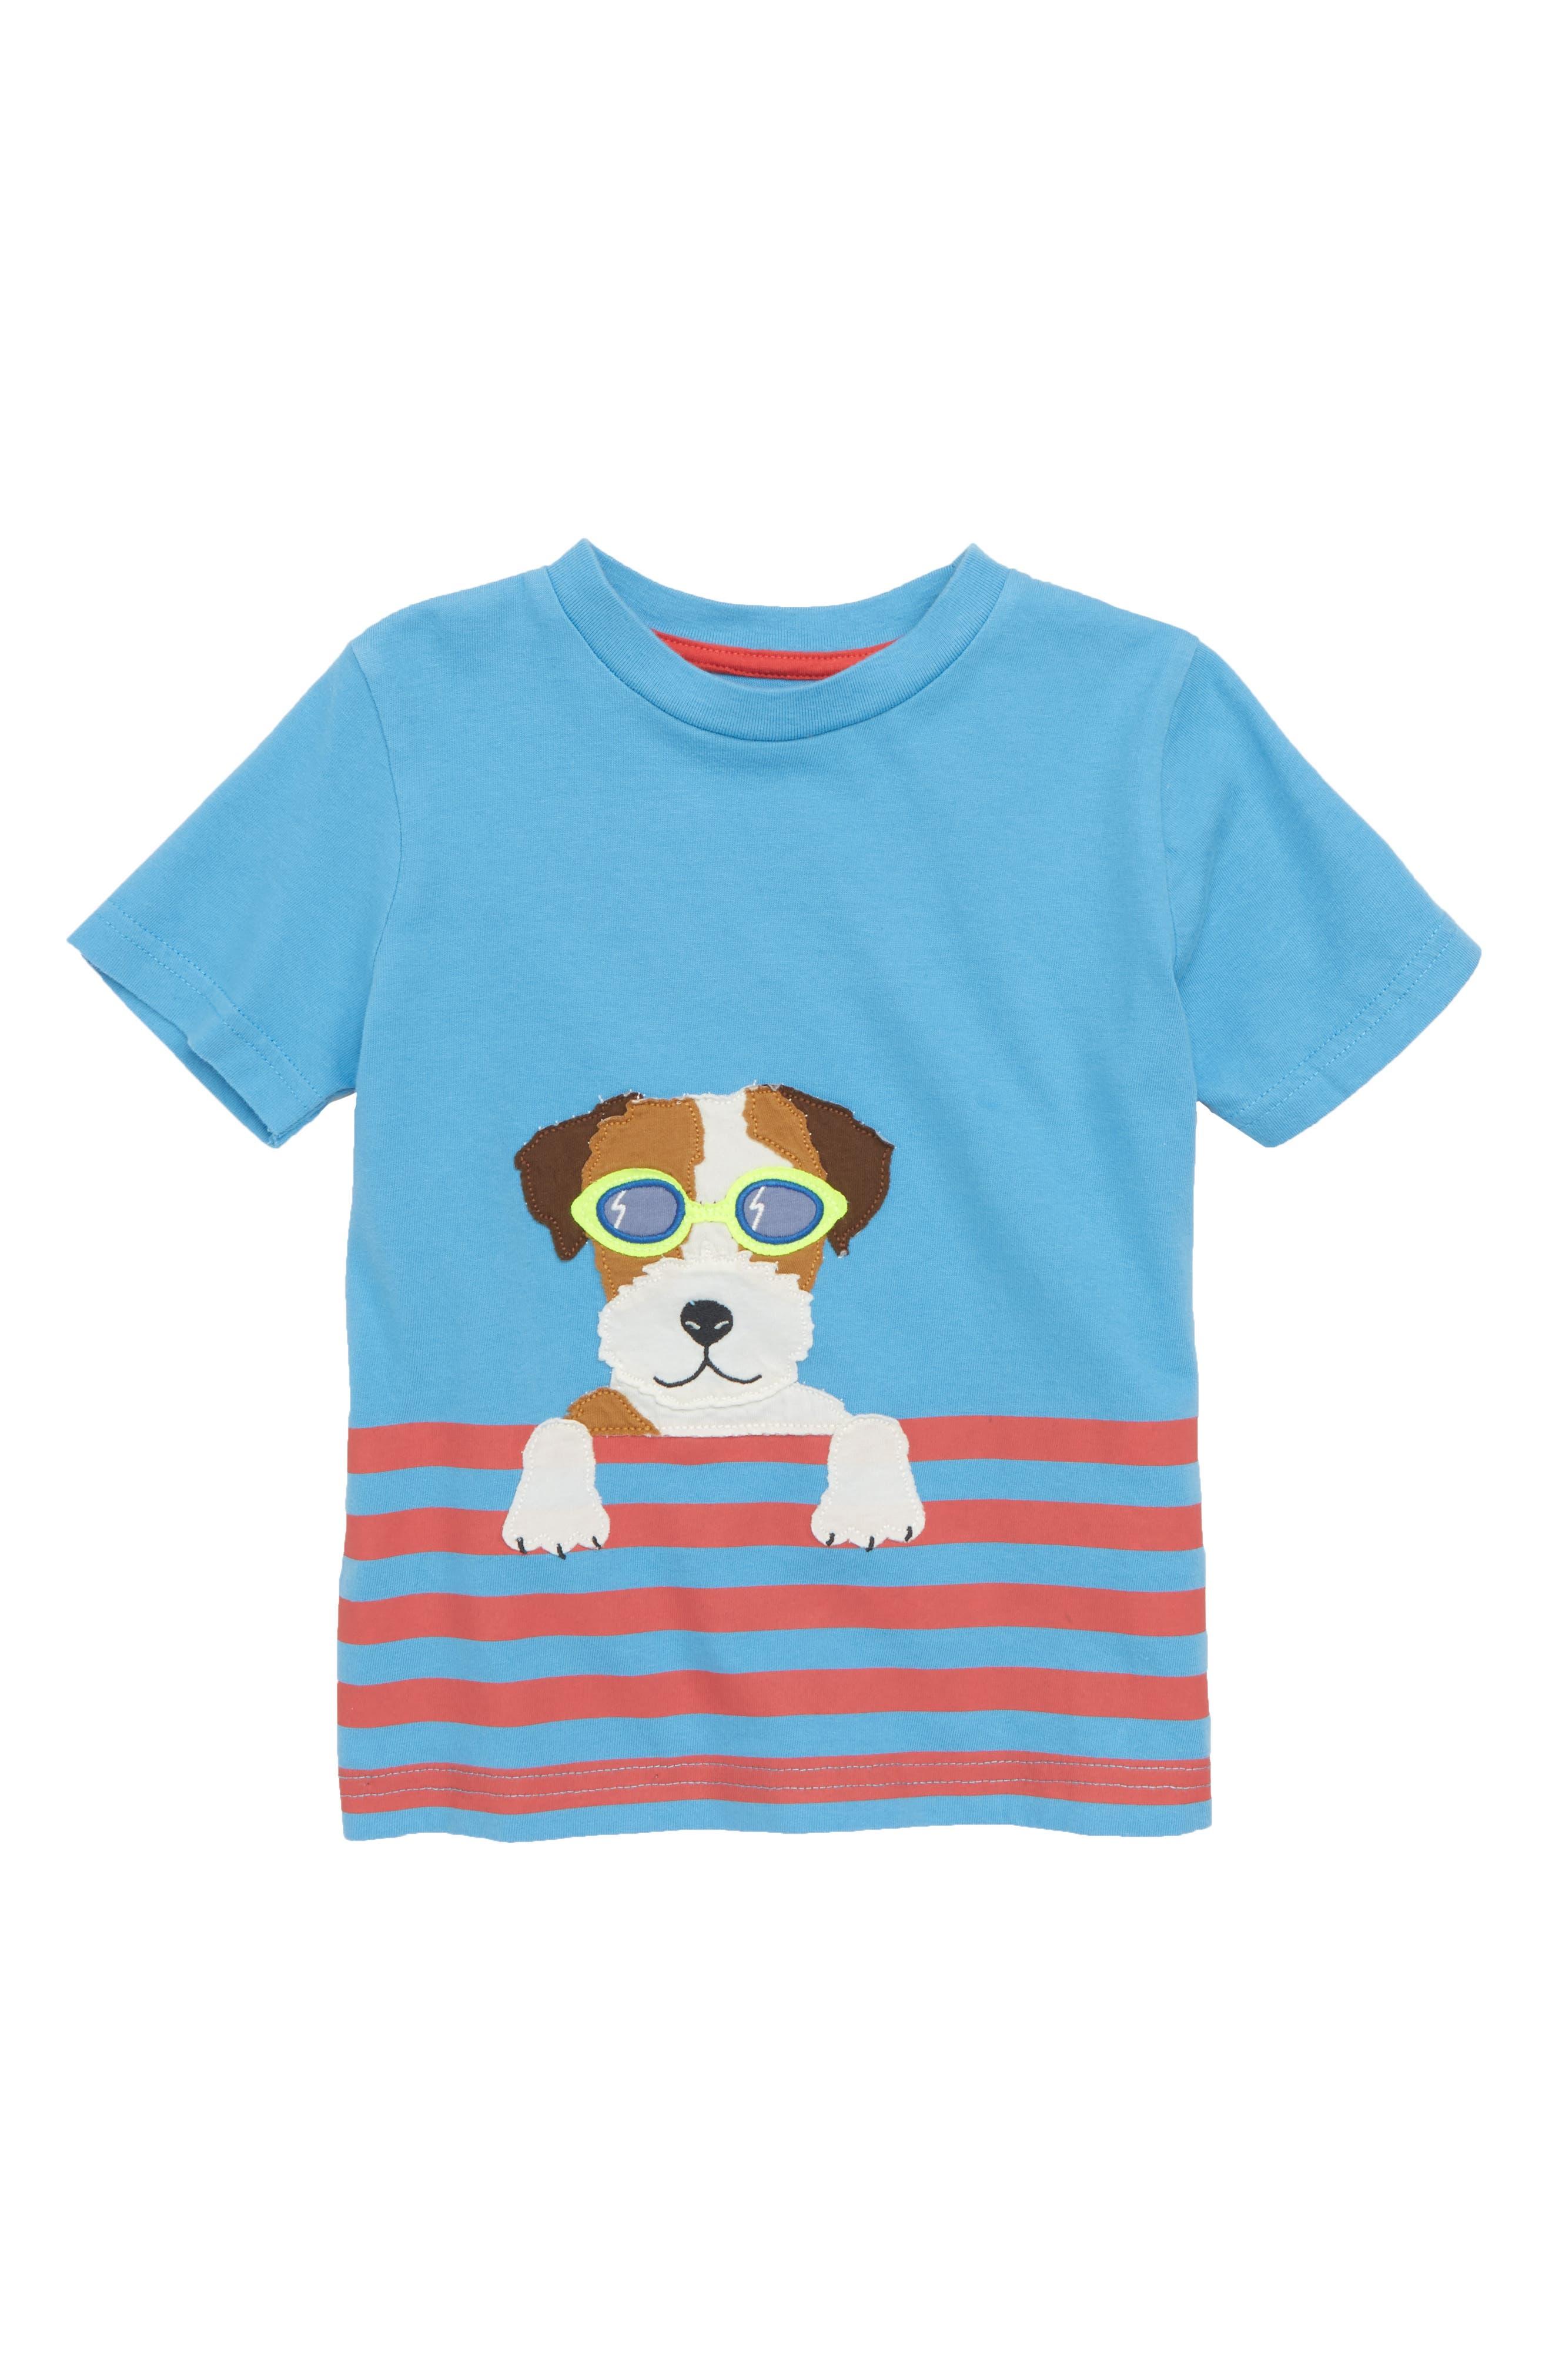 Mini Boden Paddling Pal Appliqué T-Shirt (Toddler Boys, Little Boys & Big Boys)